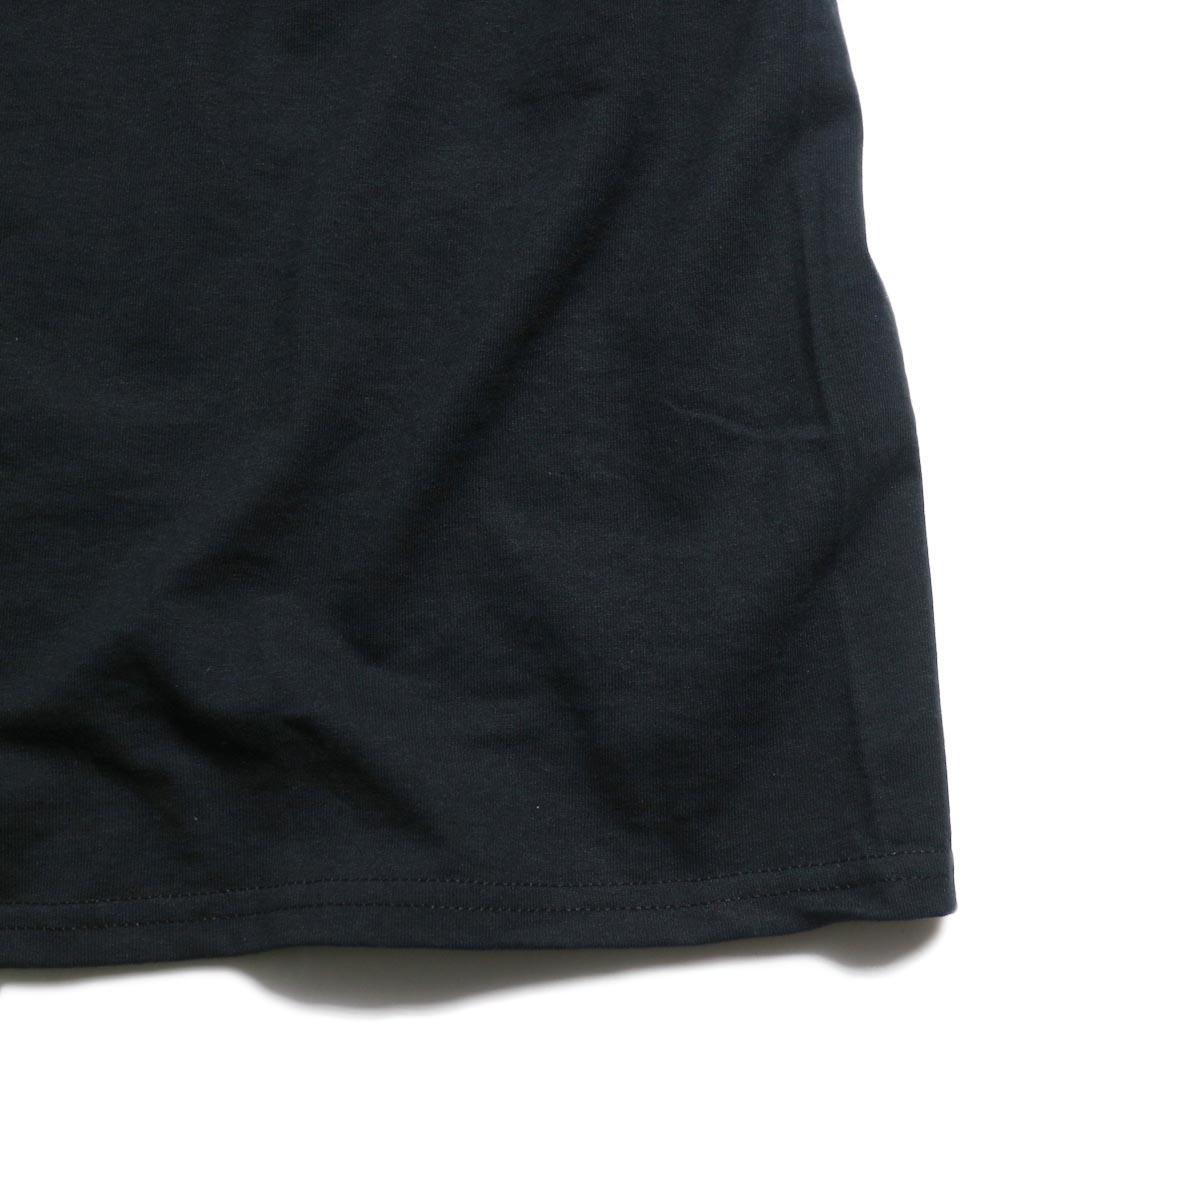 N.HOOLYWOOD × JERZEES  / 191-CS44-070 Short Sleeve Tee -Black 裾